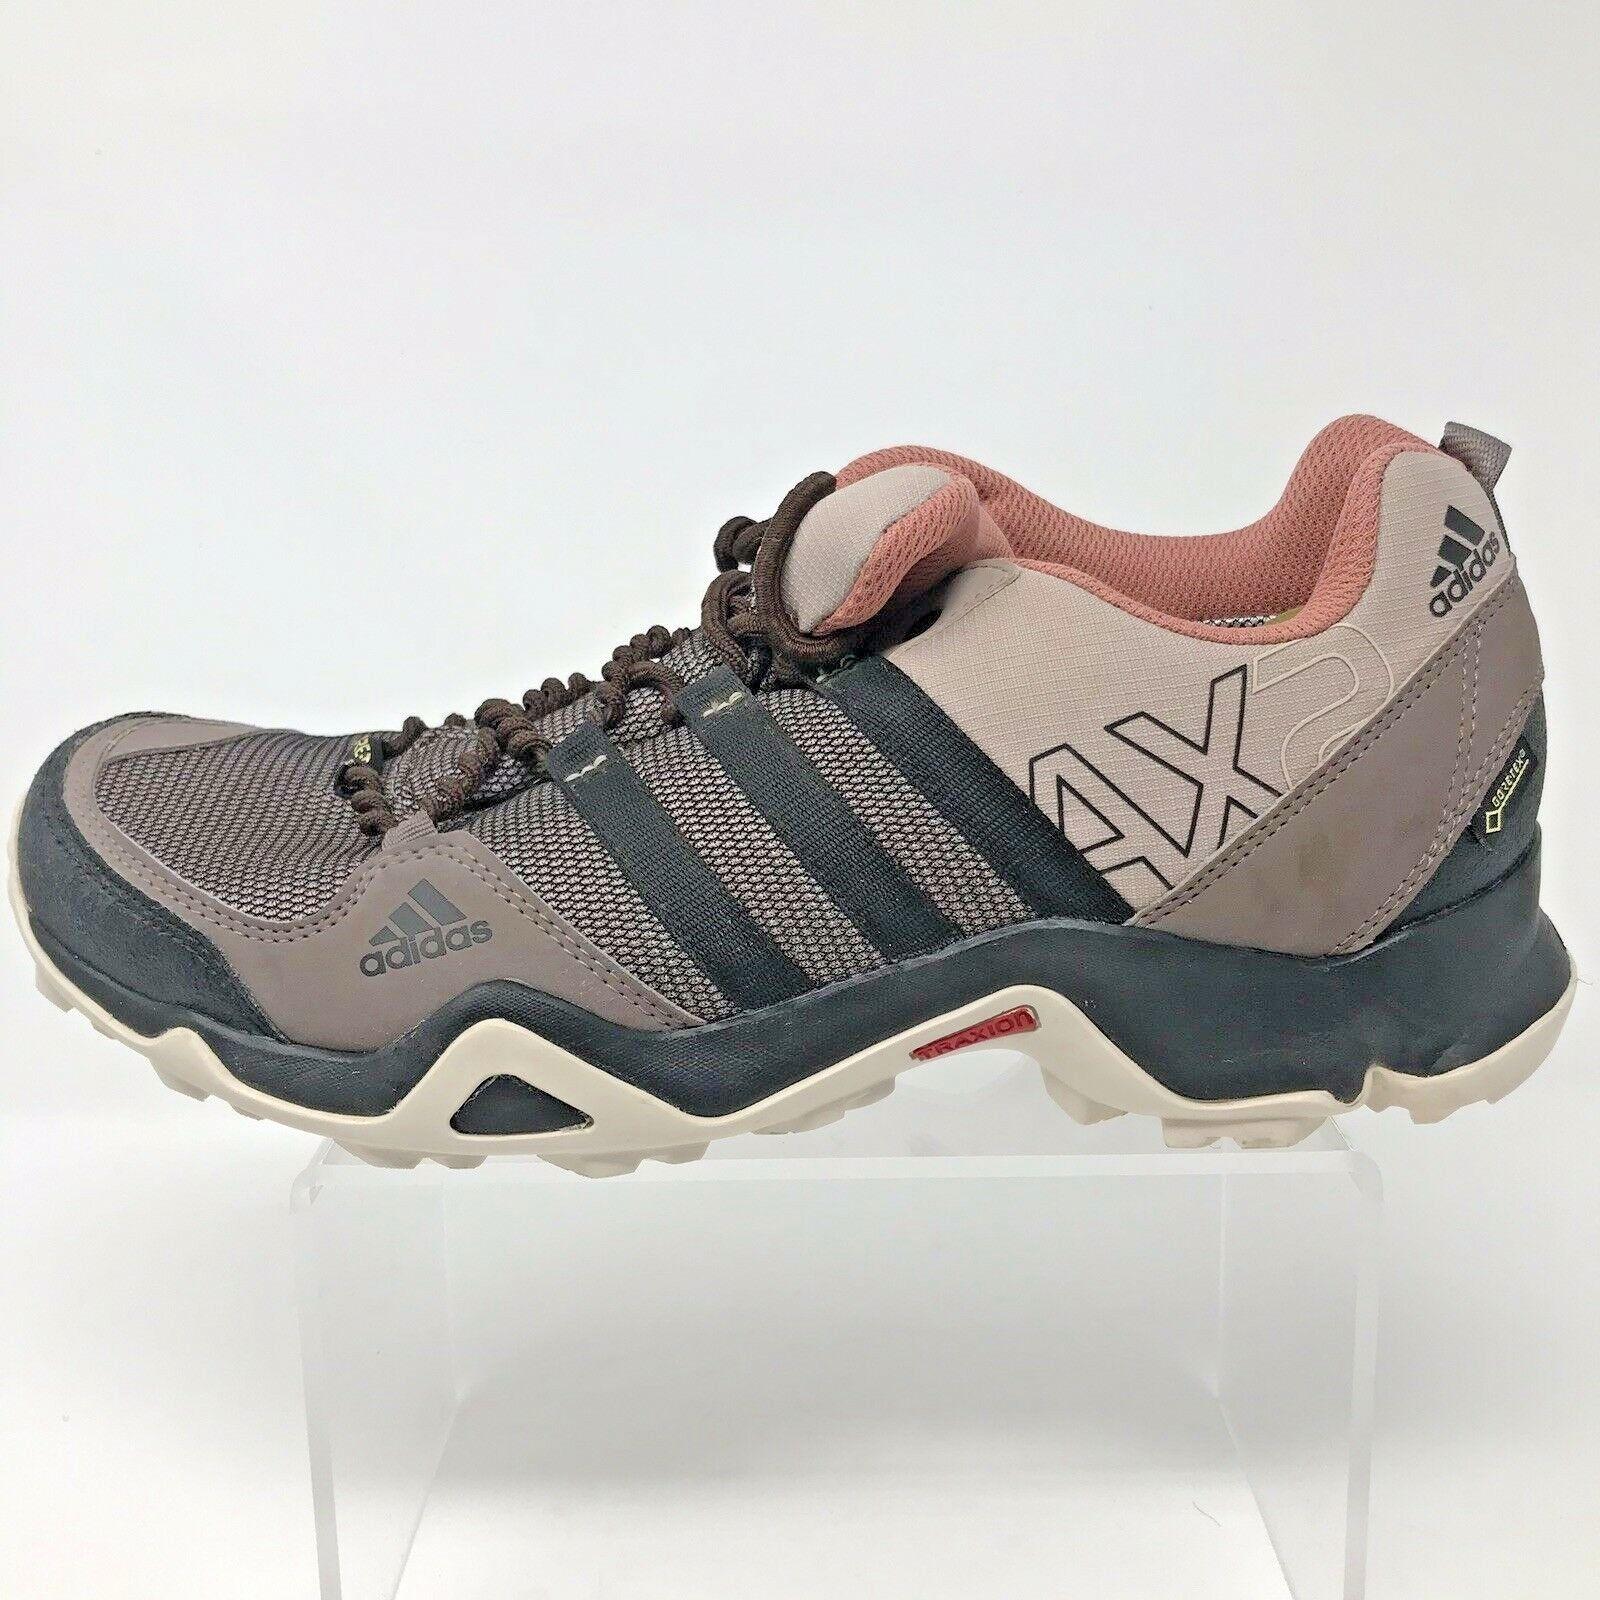 Adidas AX2 Womens 9.5 Goretex Hiking shoes AQ3961 Brown Pink